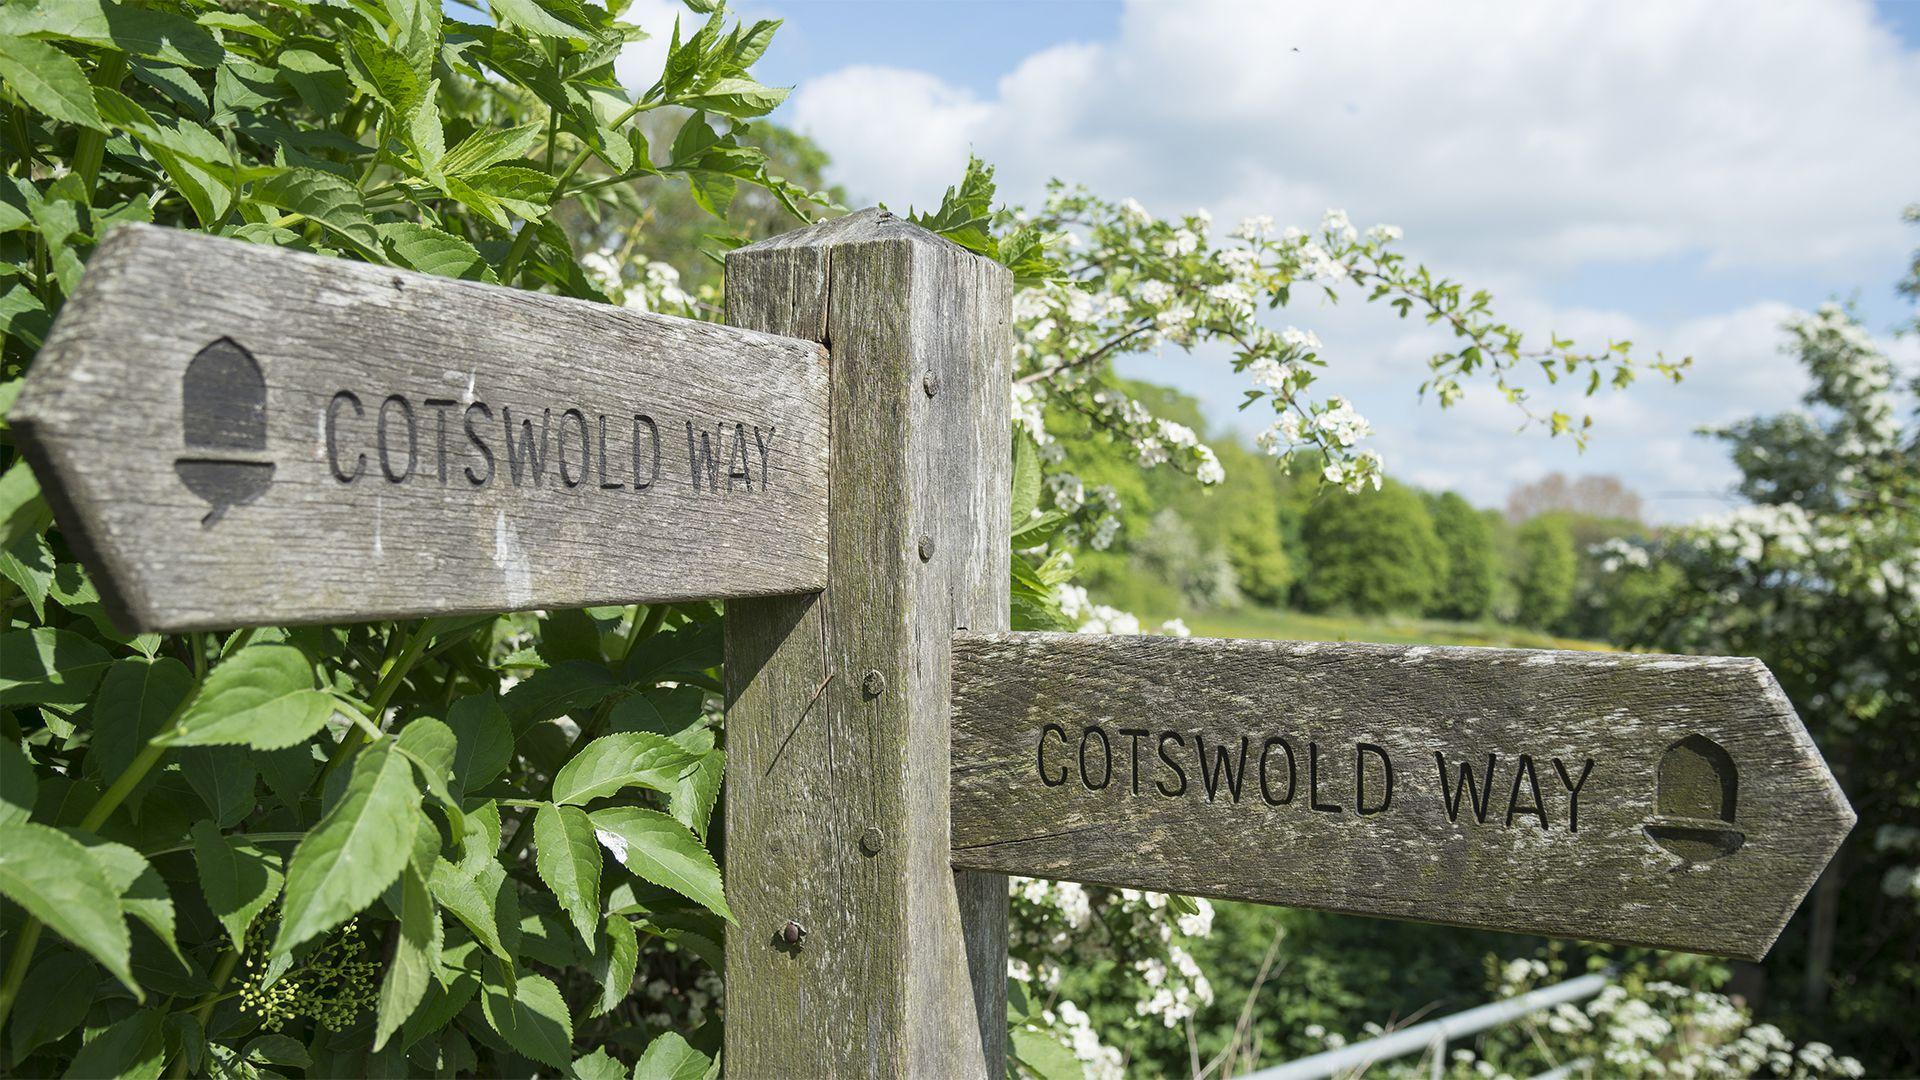 Cotswold Way, Kingfisher Cottage, Bolthole Retreats